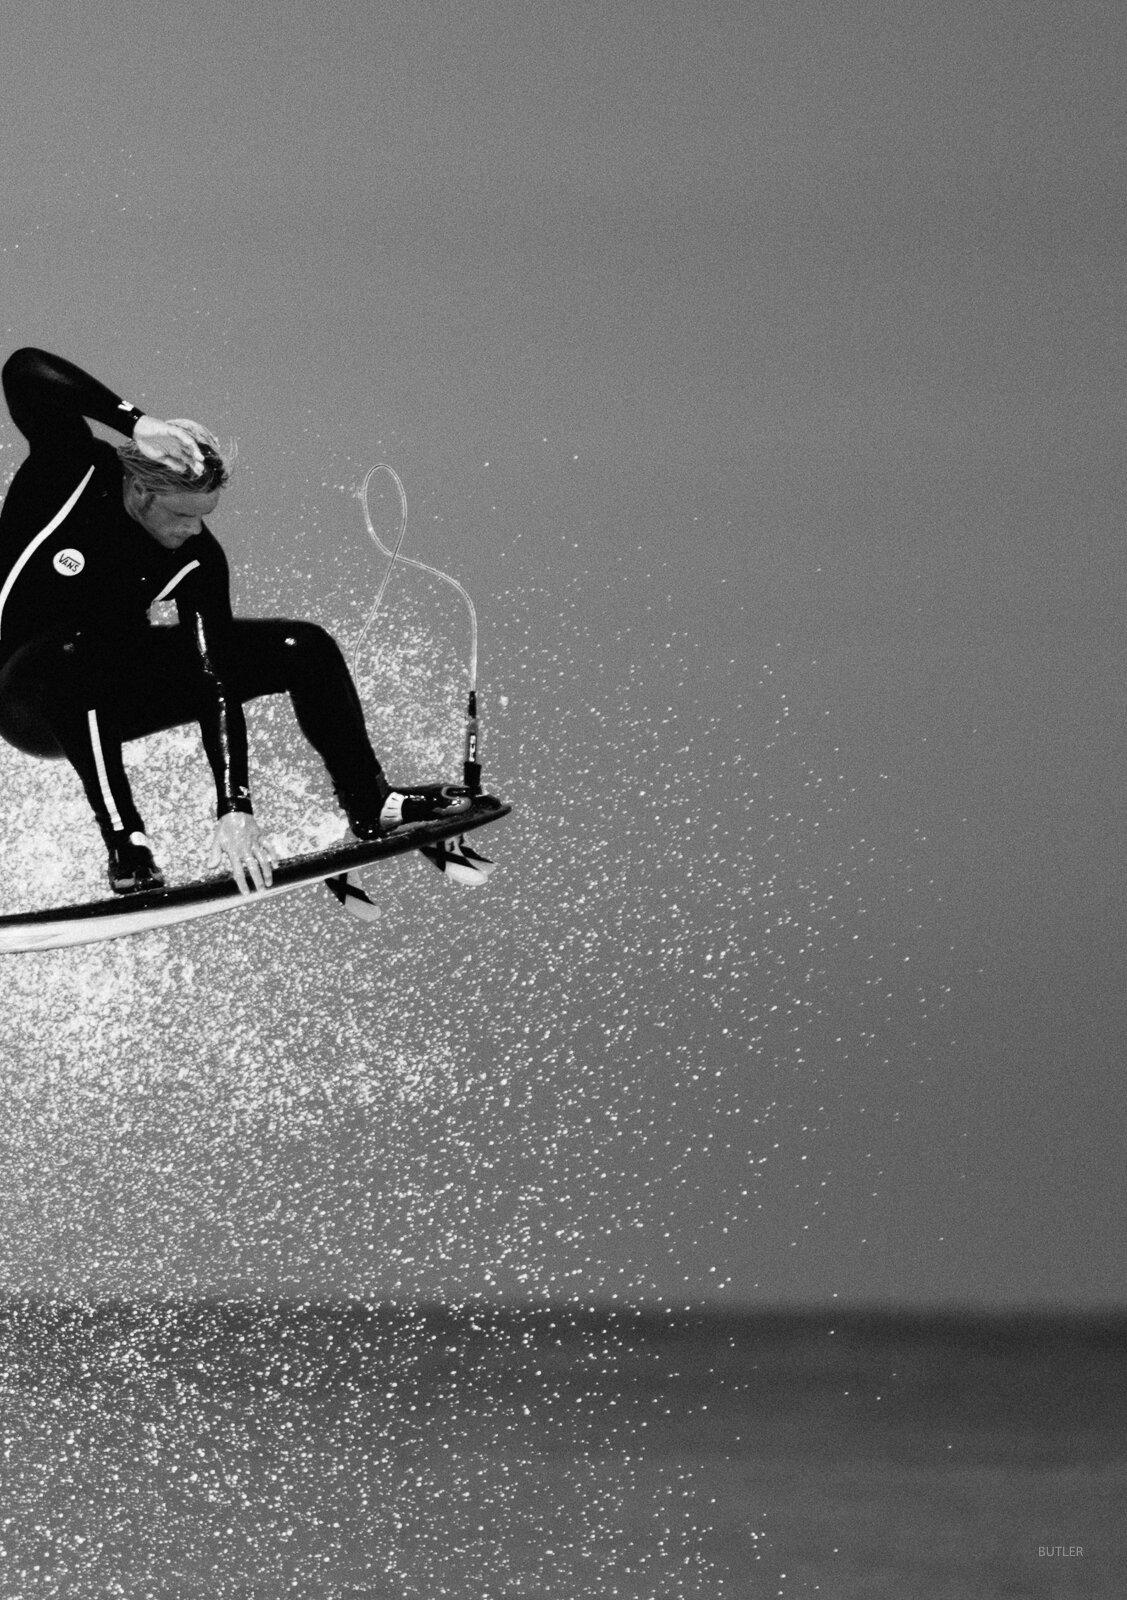 toby-butler-photo-devon-cornwall-lifestyle-photogrpher-photography-travel-culture-commercial-editorial-advertising-marketing-photo-surfer-girl-swimwear-sports-wear-clothing-england-united-kingdom-europe57.jpg